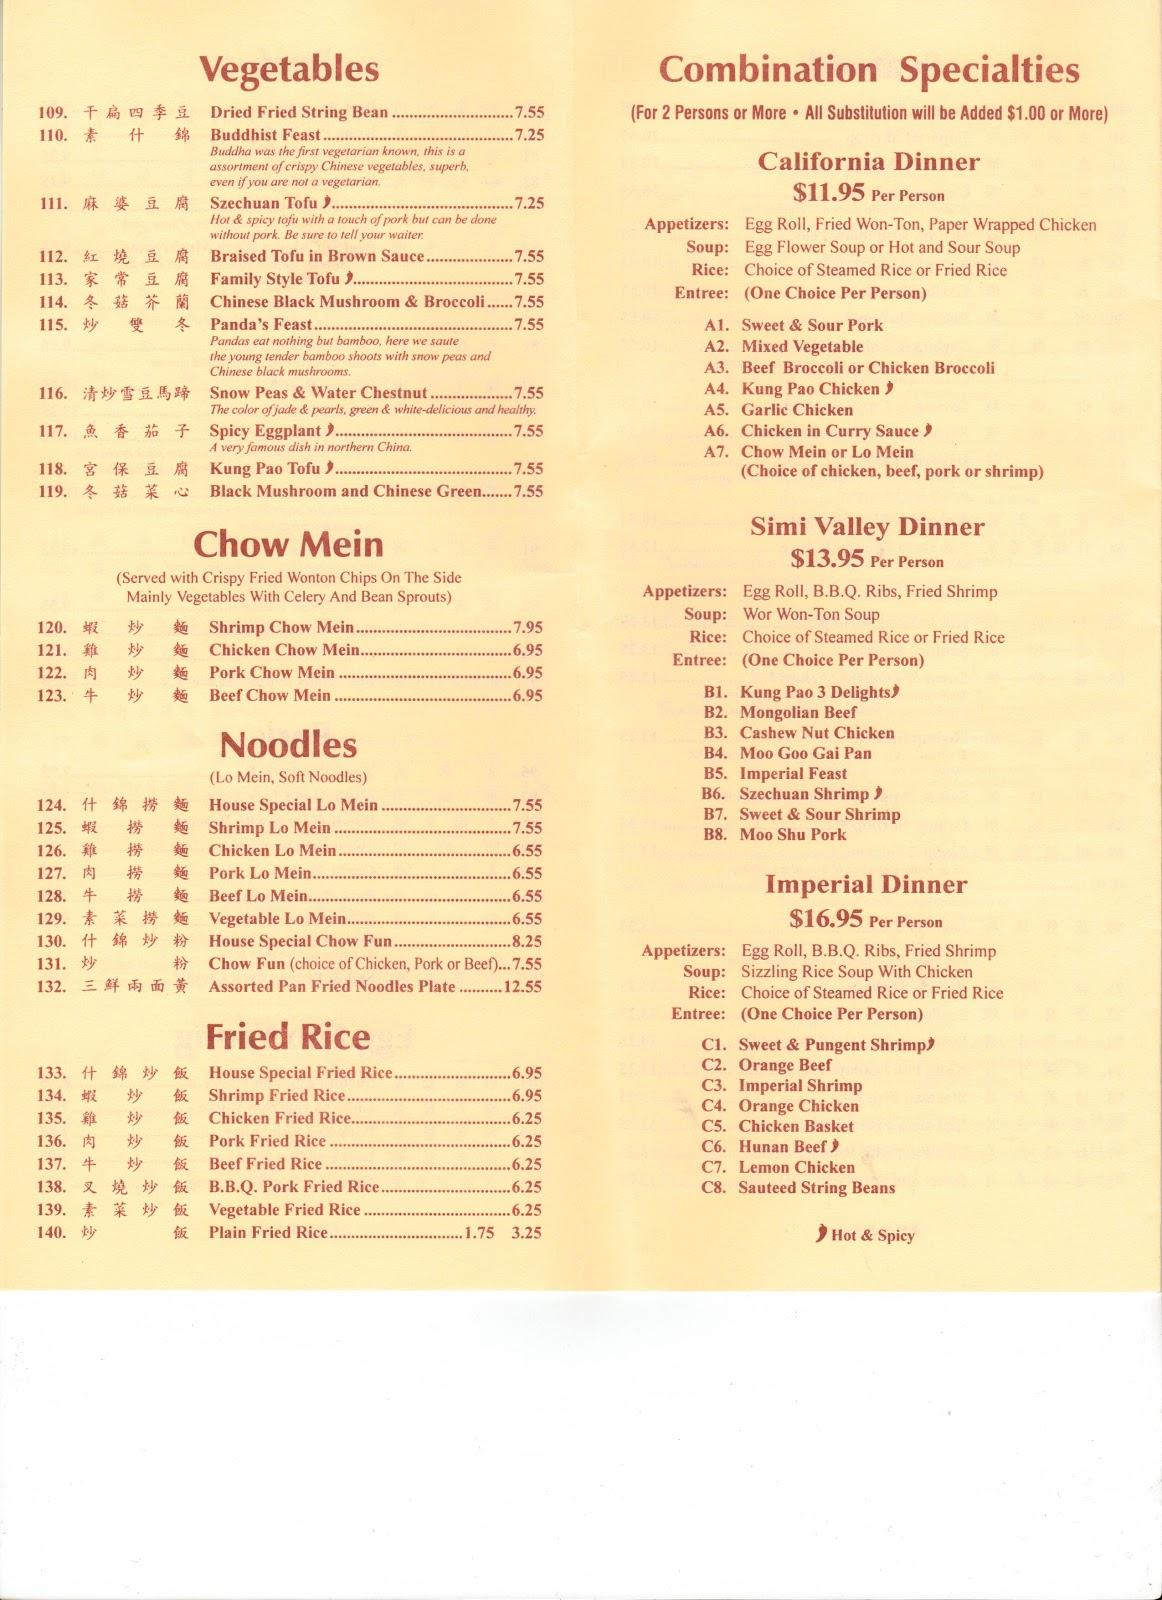 Imperial Garden Chinese Restaurant Newport Pagnell Menu Garden Ftempo